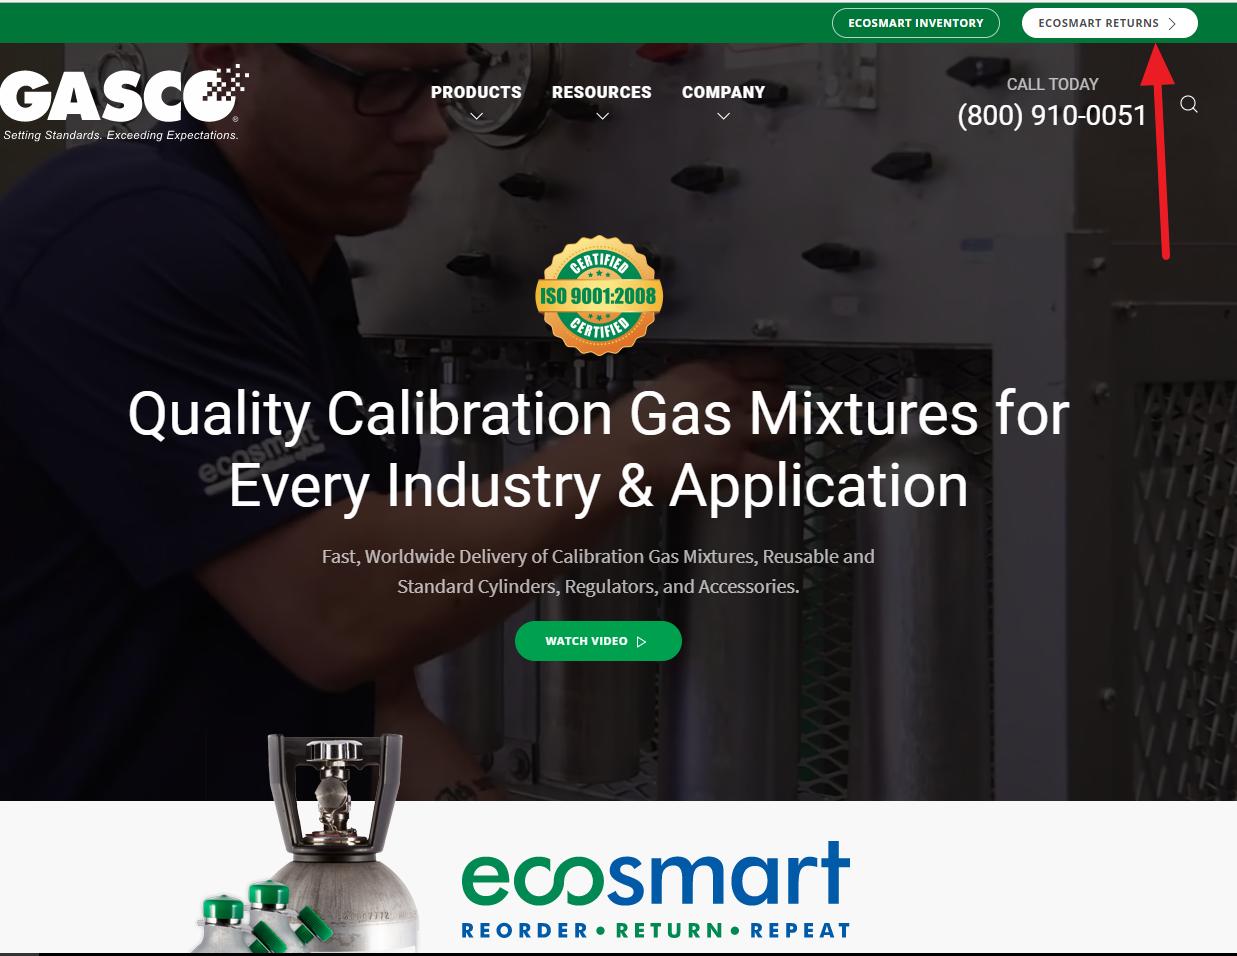 ecosmart-return-info.png